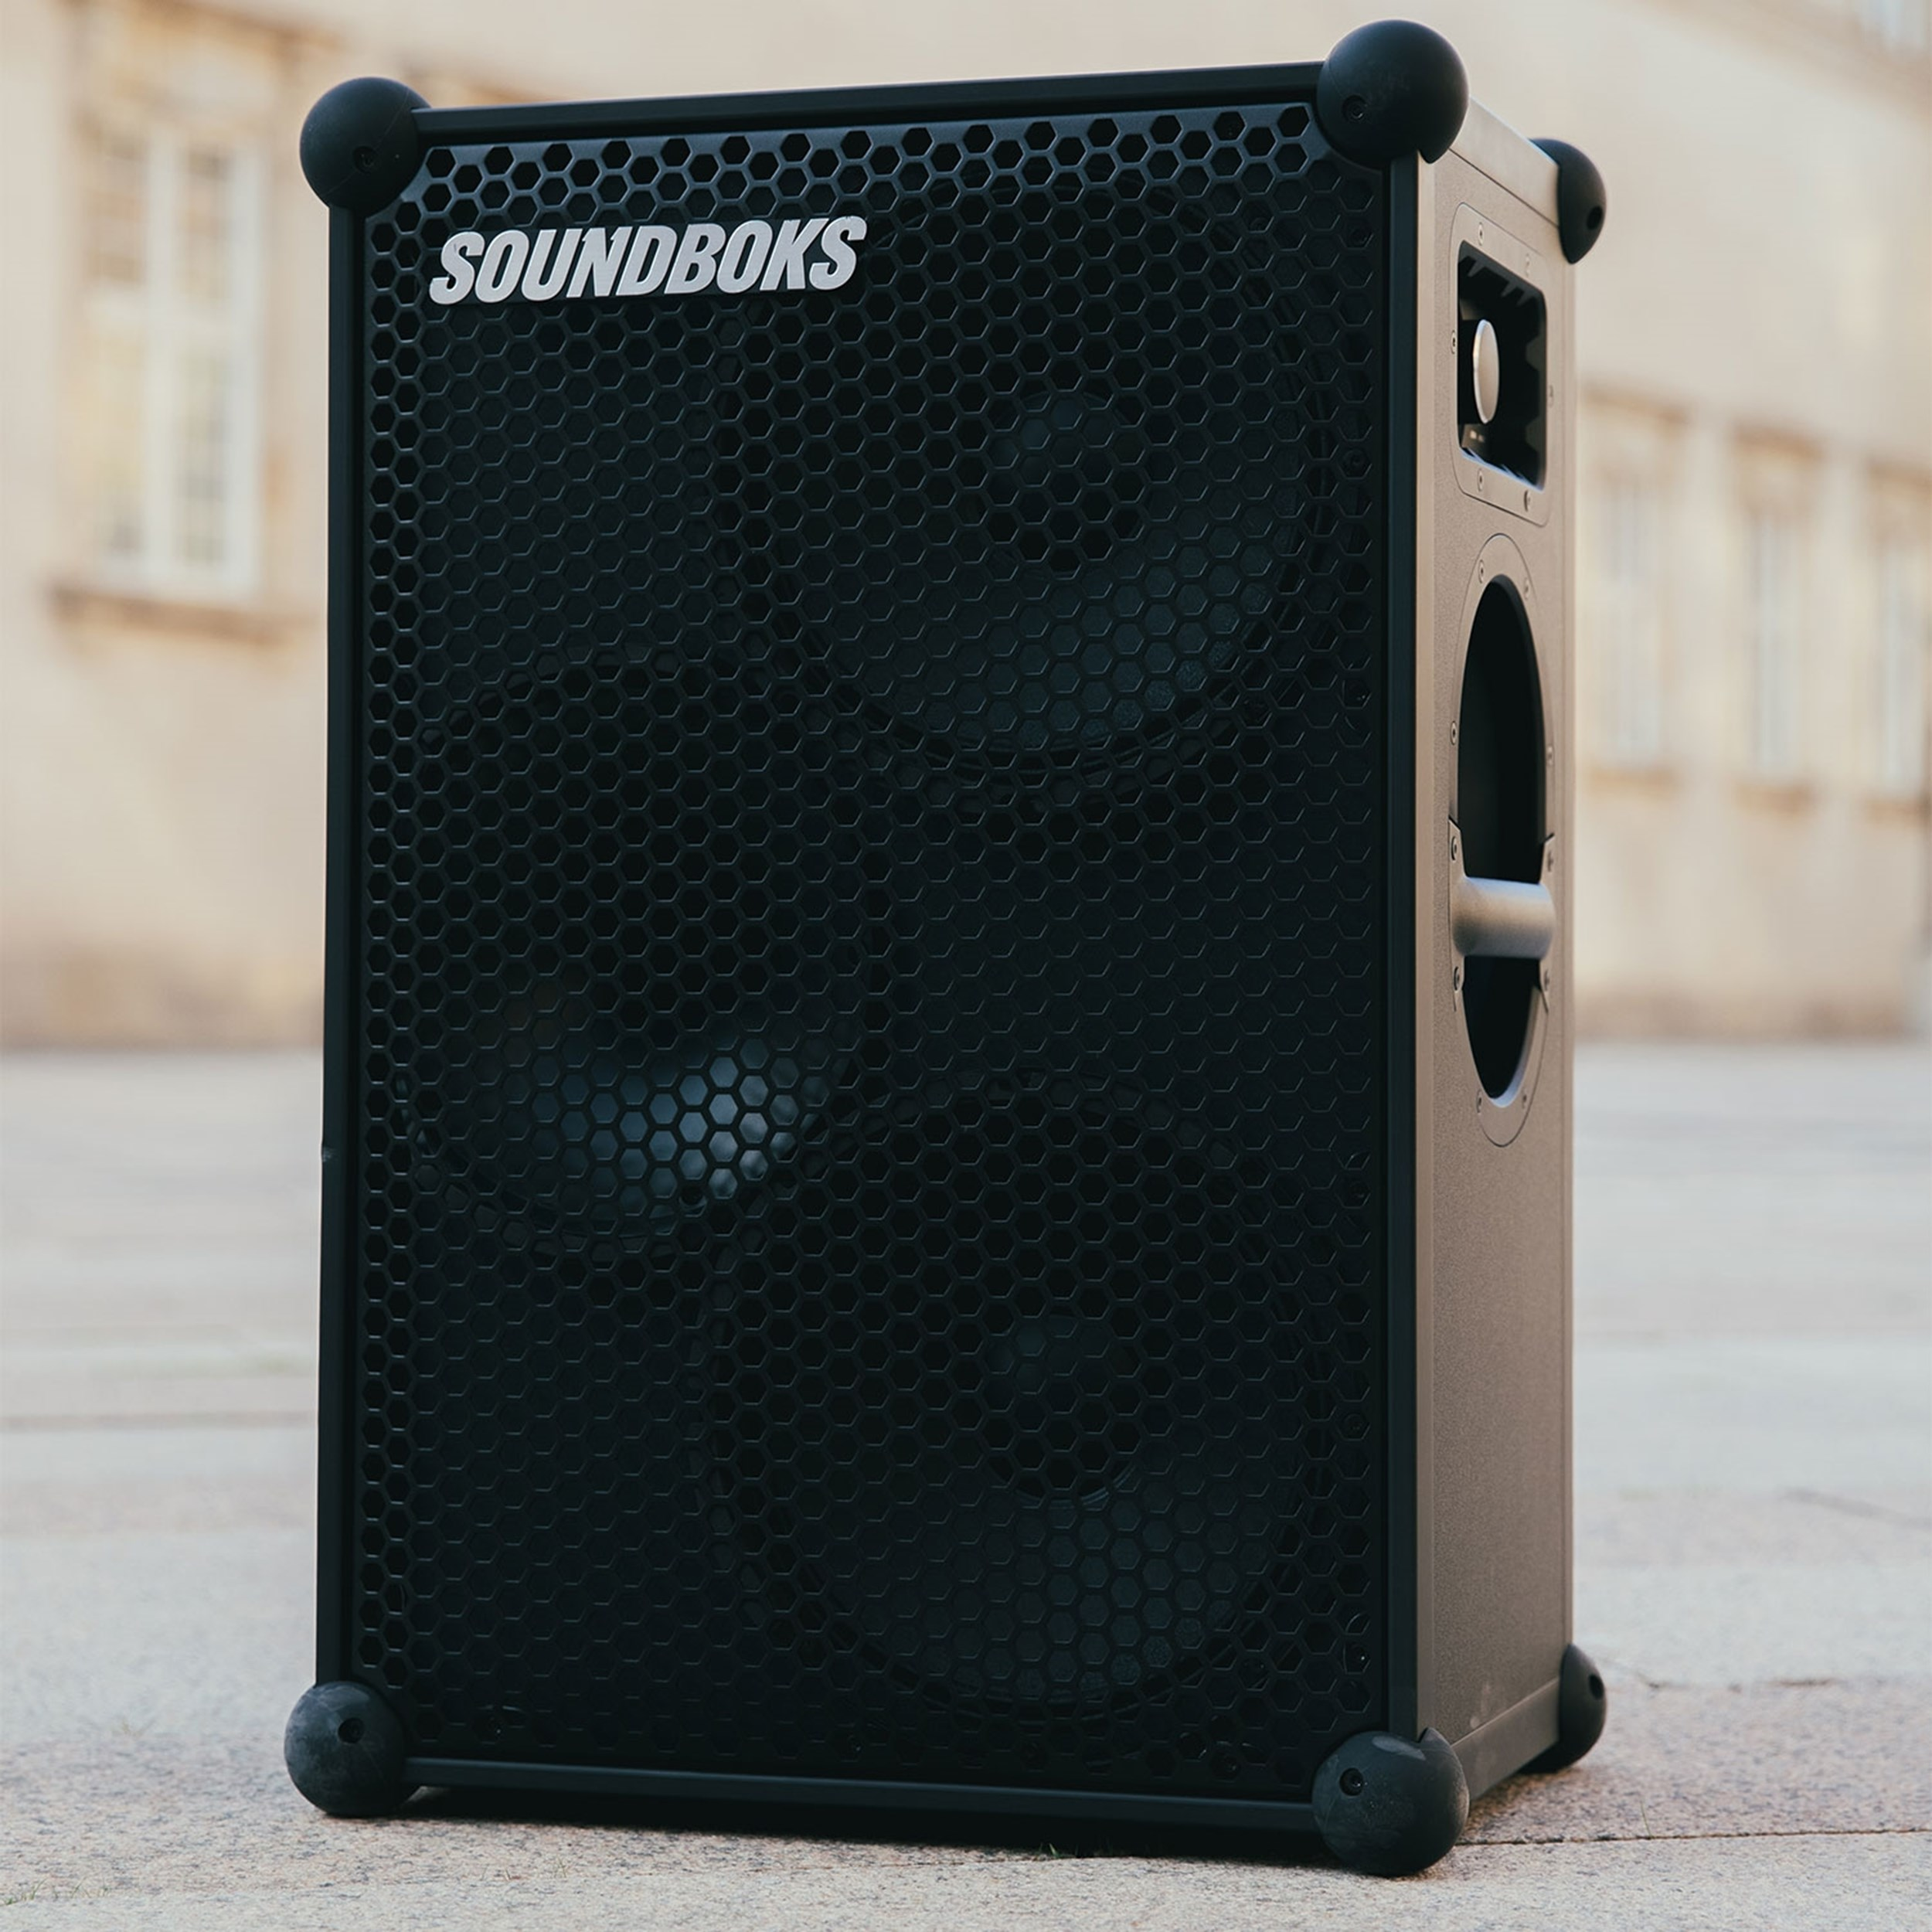 Soundboks The New Soundboks Bluetooth høyttaler